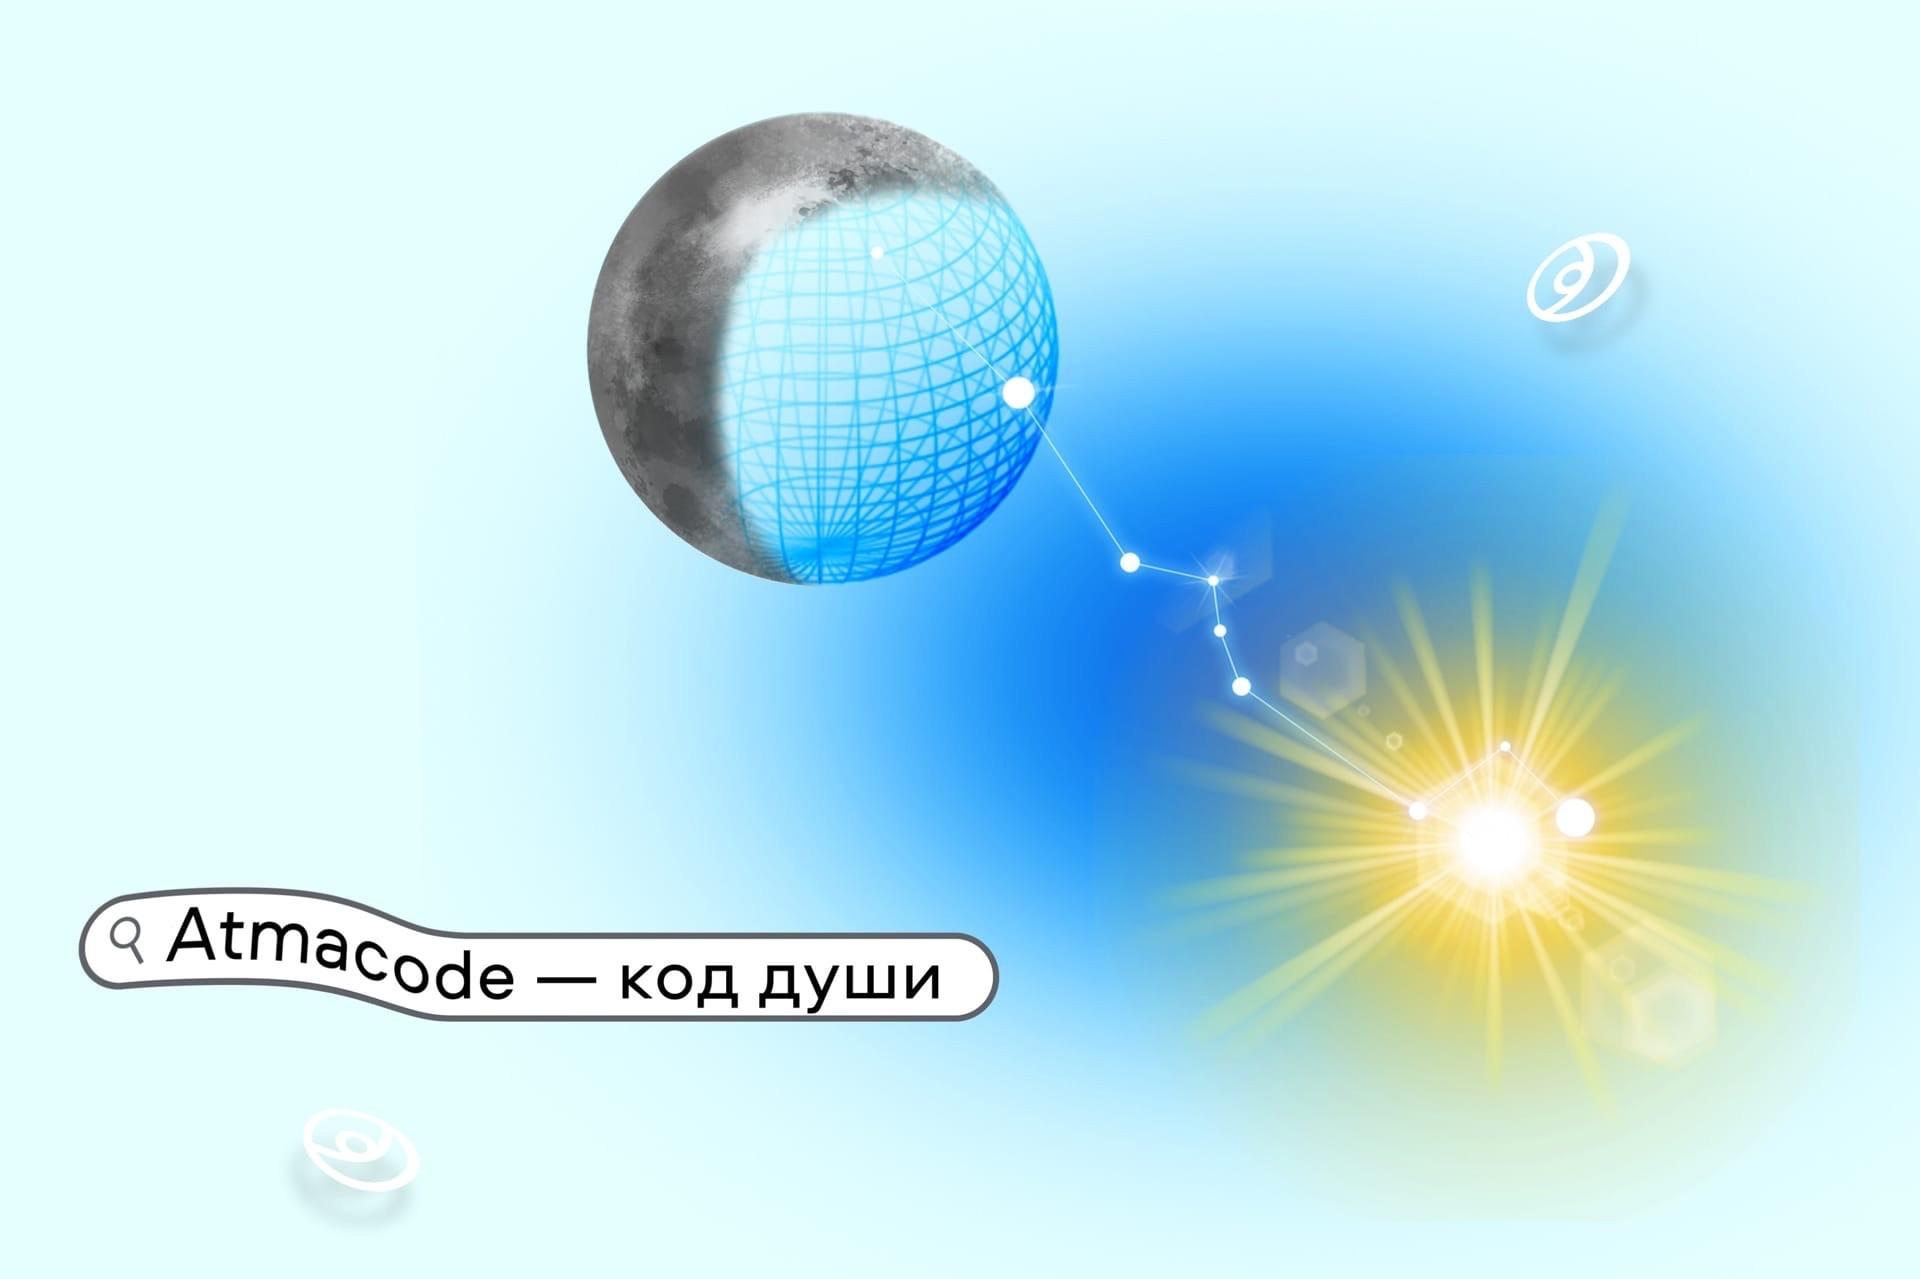 Atmacode